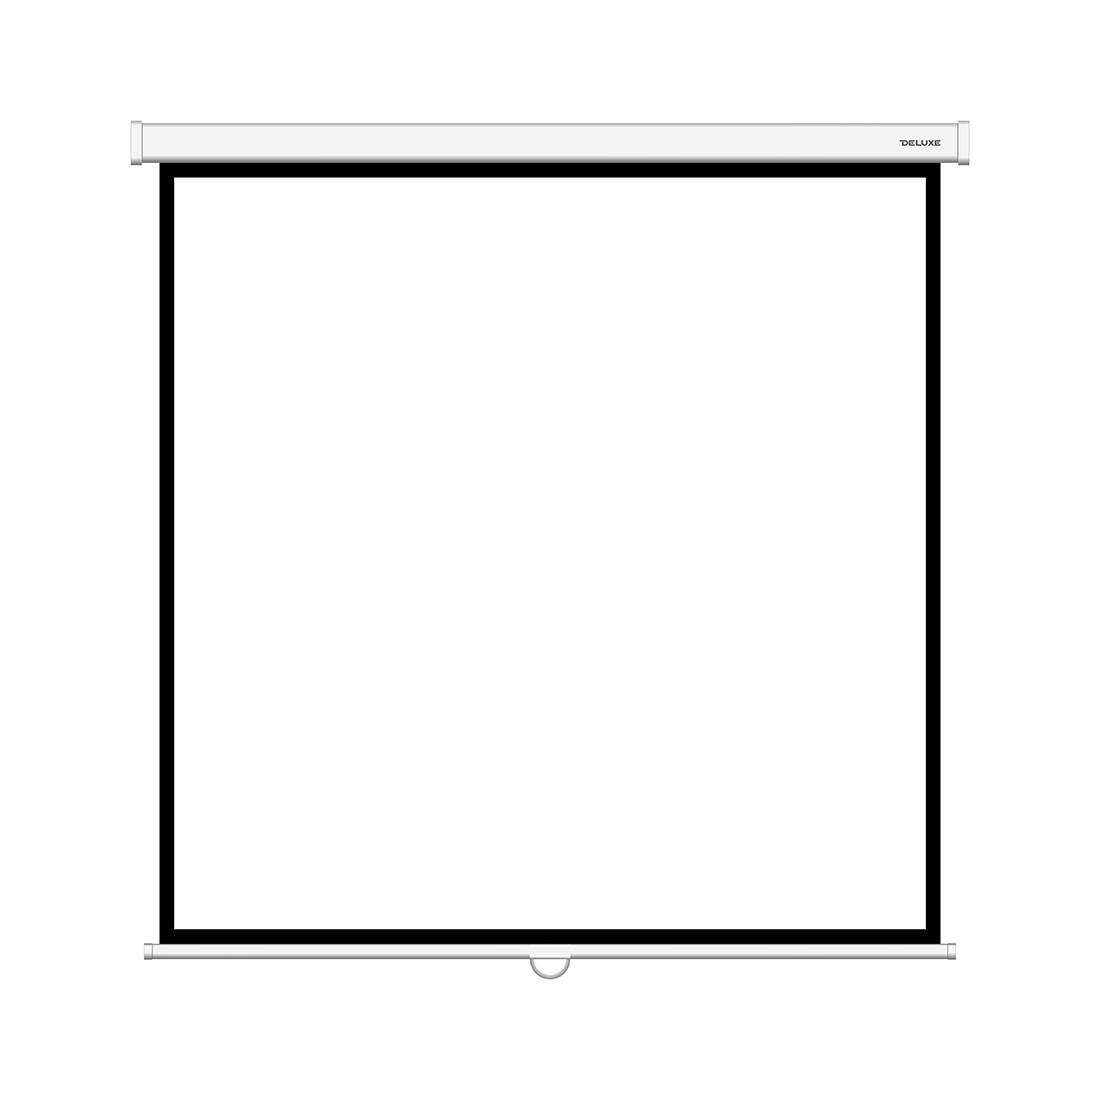 Экран для проекторов Deluxe DLS-M203xW Настенный 203x203 Matt white Белый